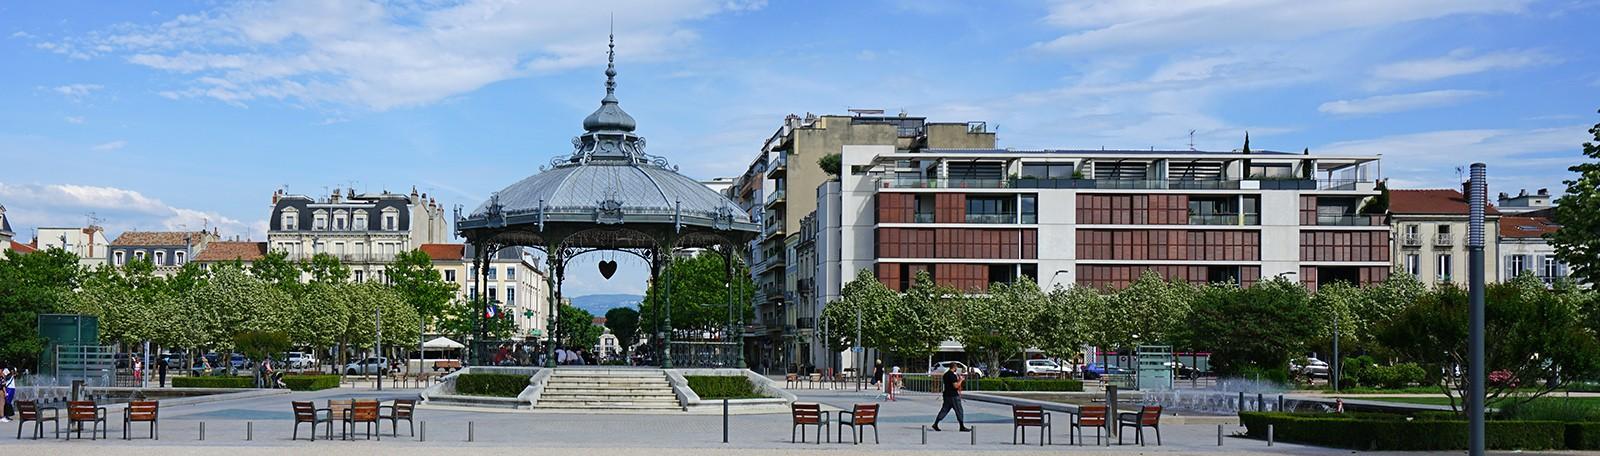 Stationner à Valence Hôtel de Ville